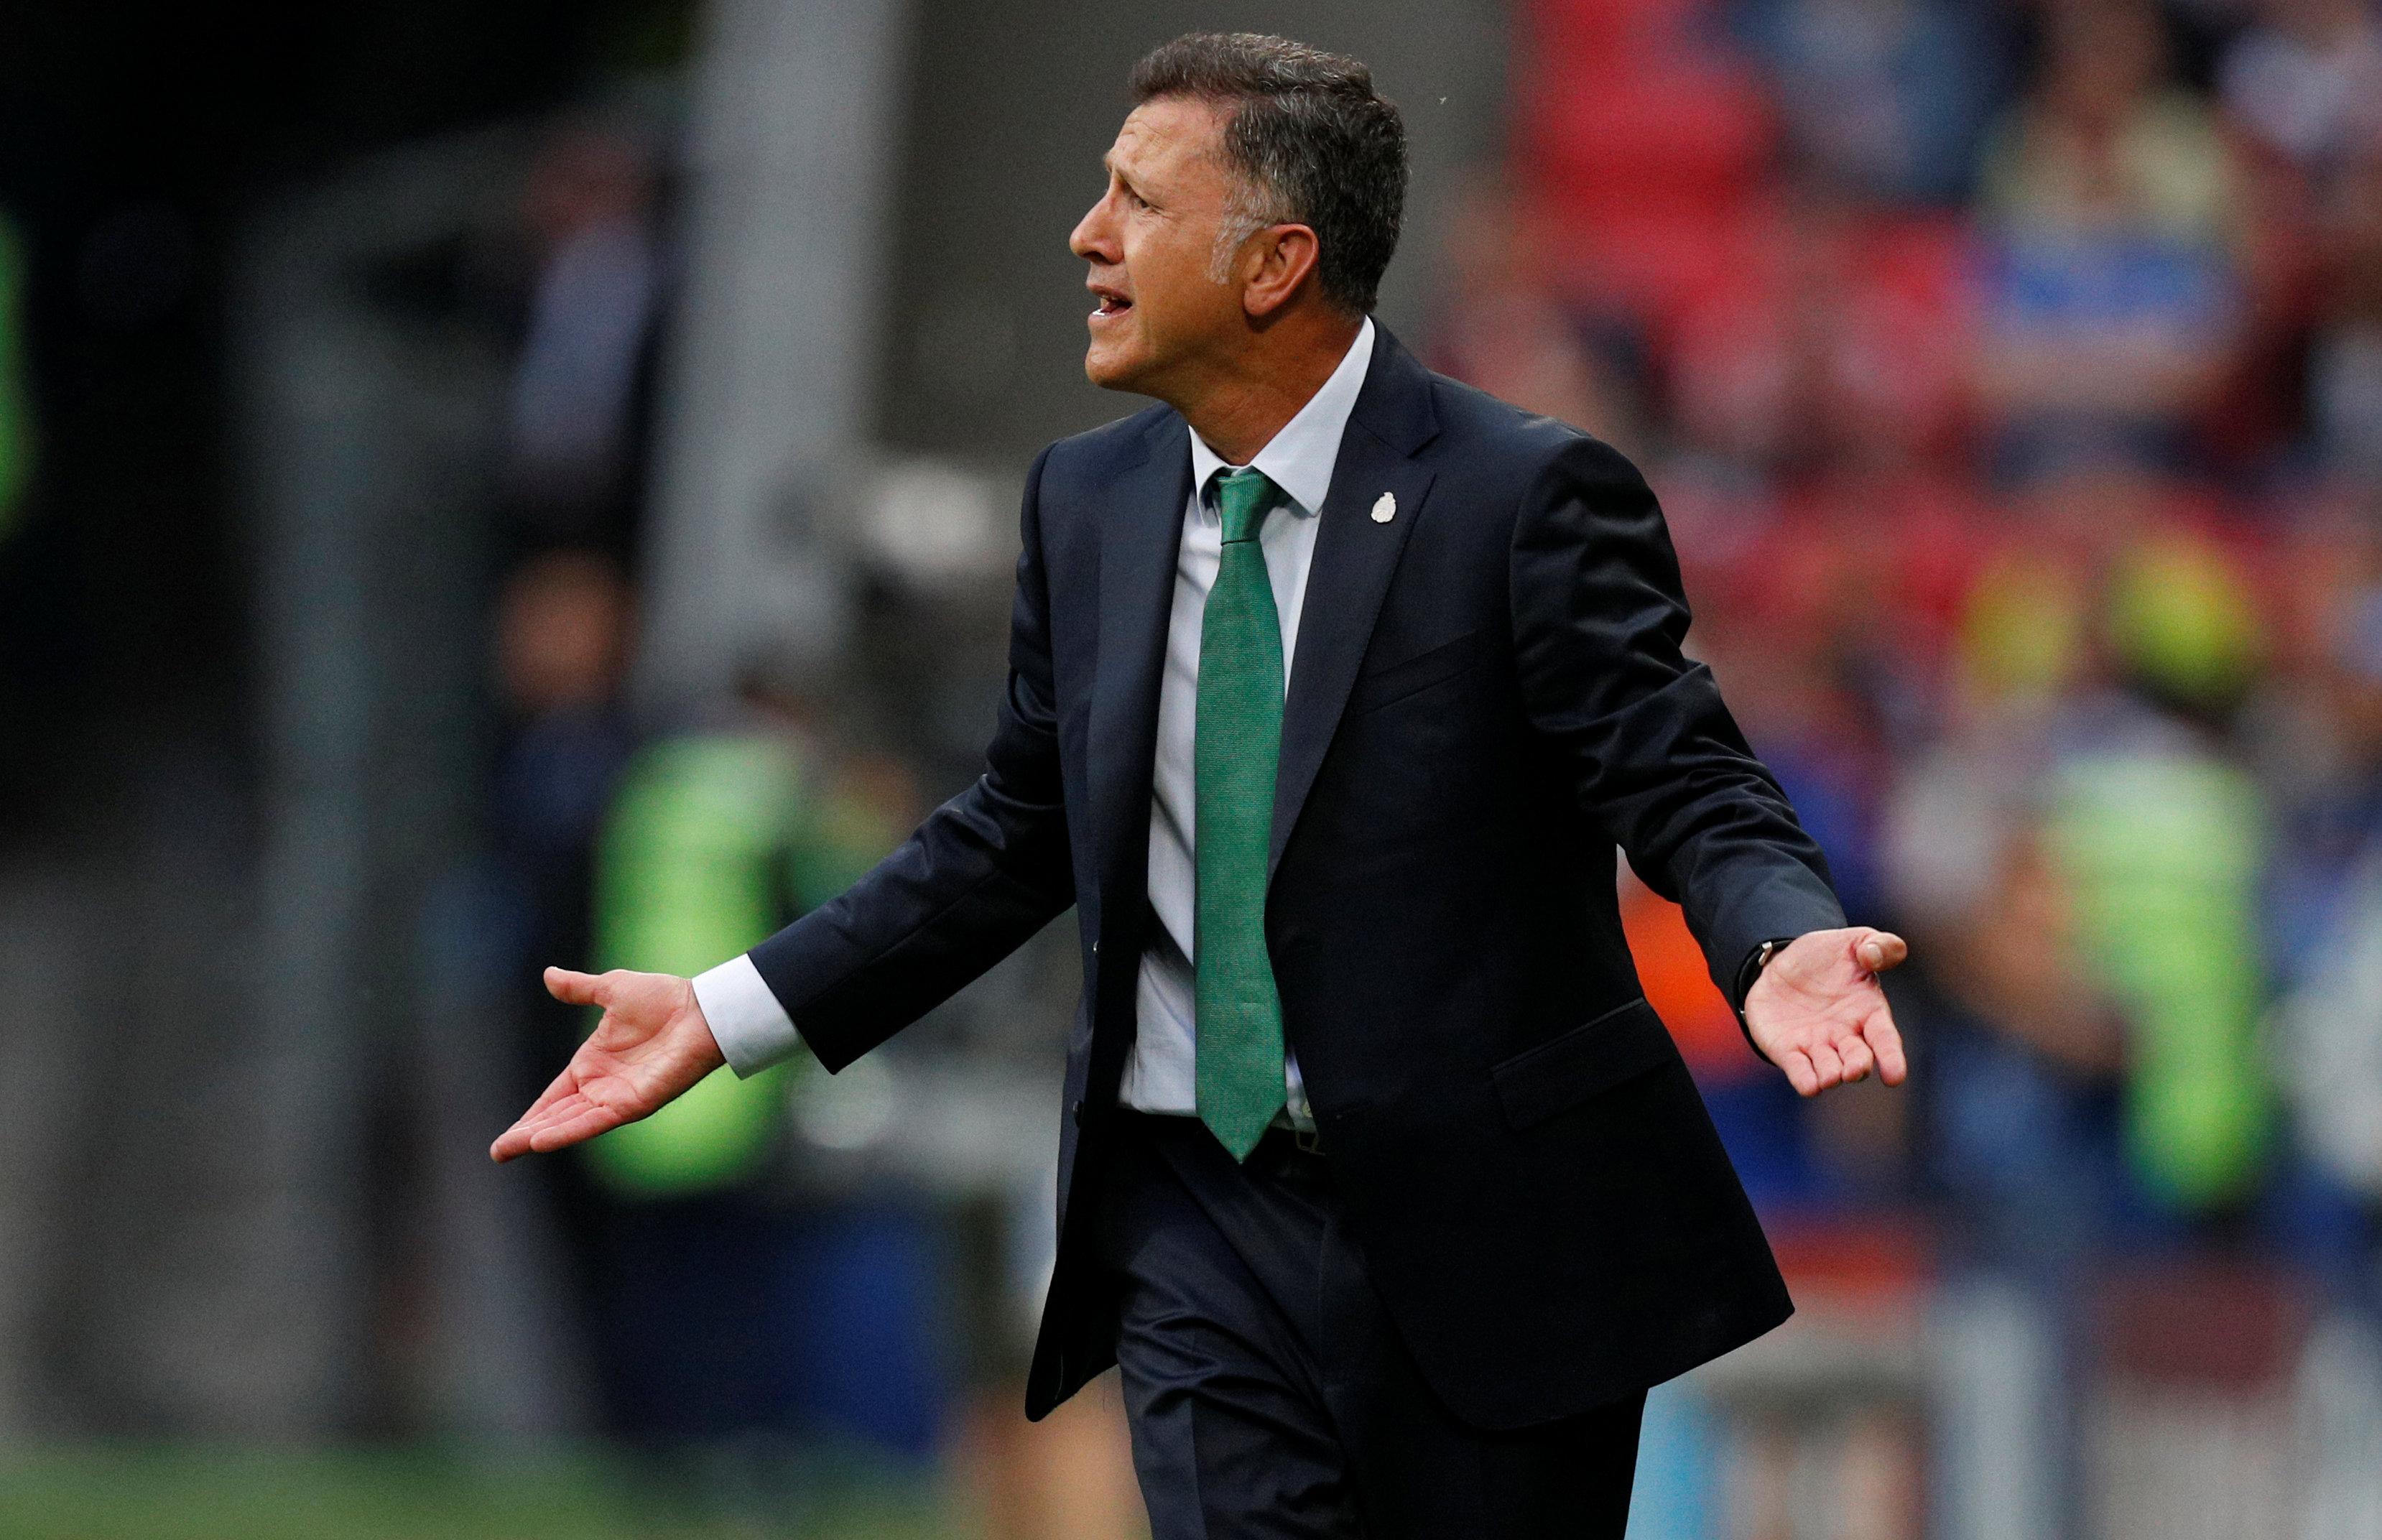 Photo of رويترز: إيقاف مدرب المكسيك 6 مباريات لإهانته الحكام في كأس القارات